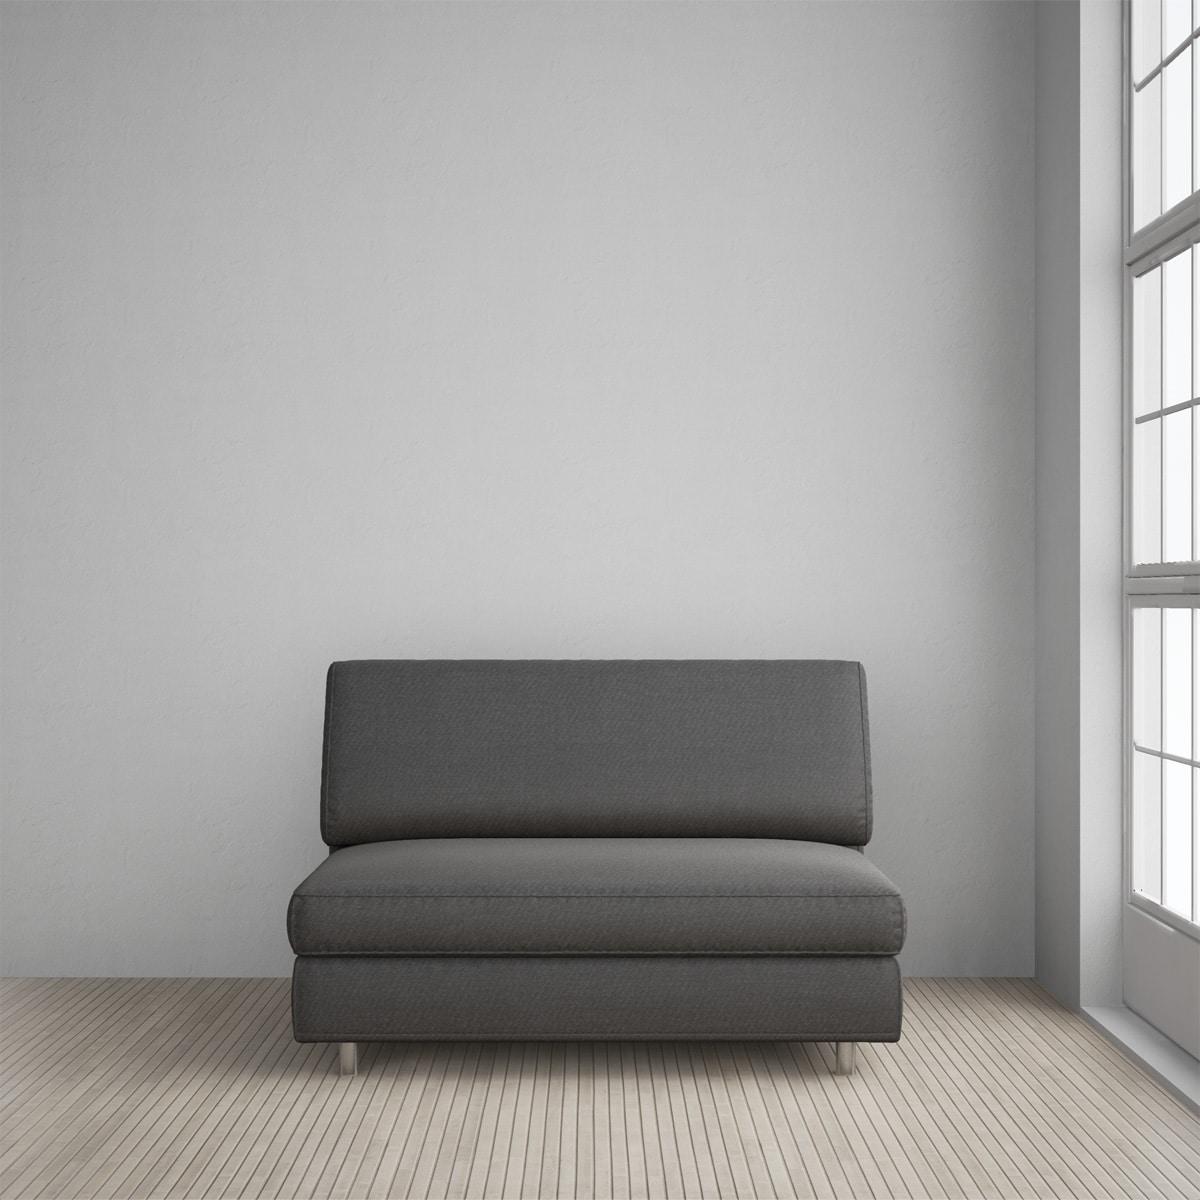 cassina mister sofa module 06 ue4arch. Black Bedroom Furniture Sets. Home Design Ideas